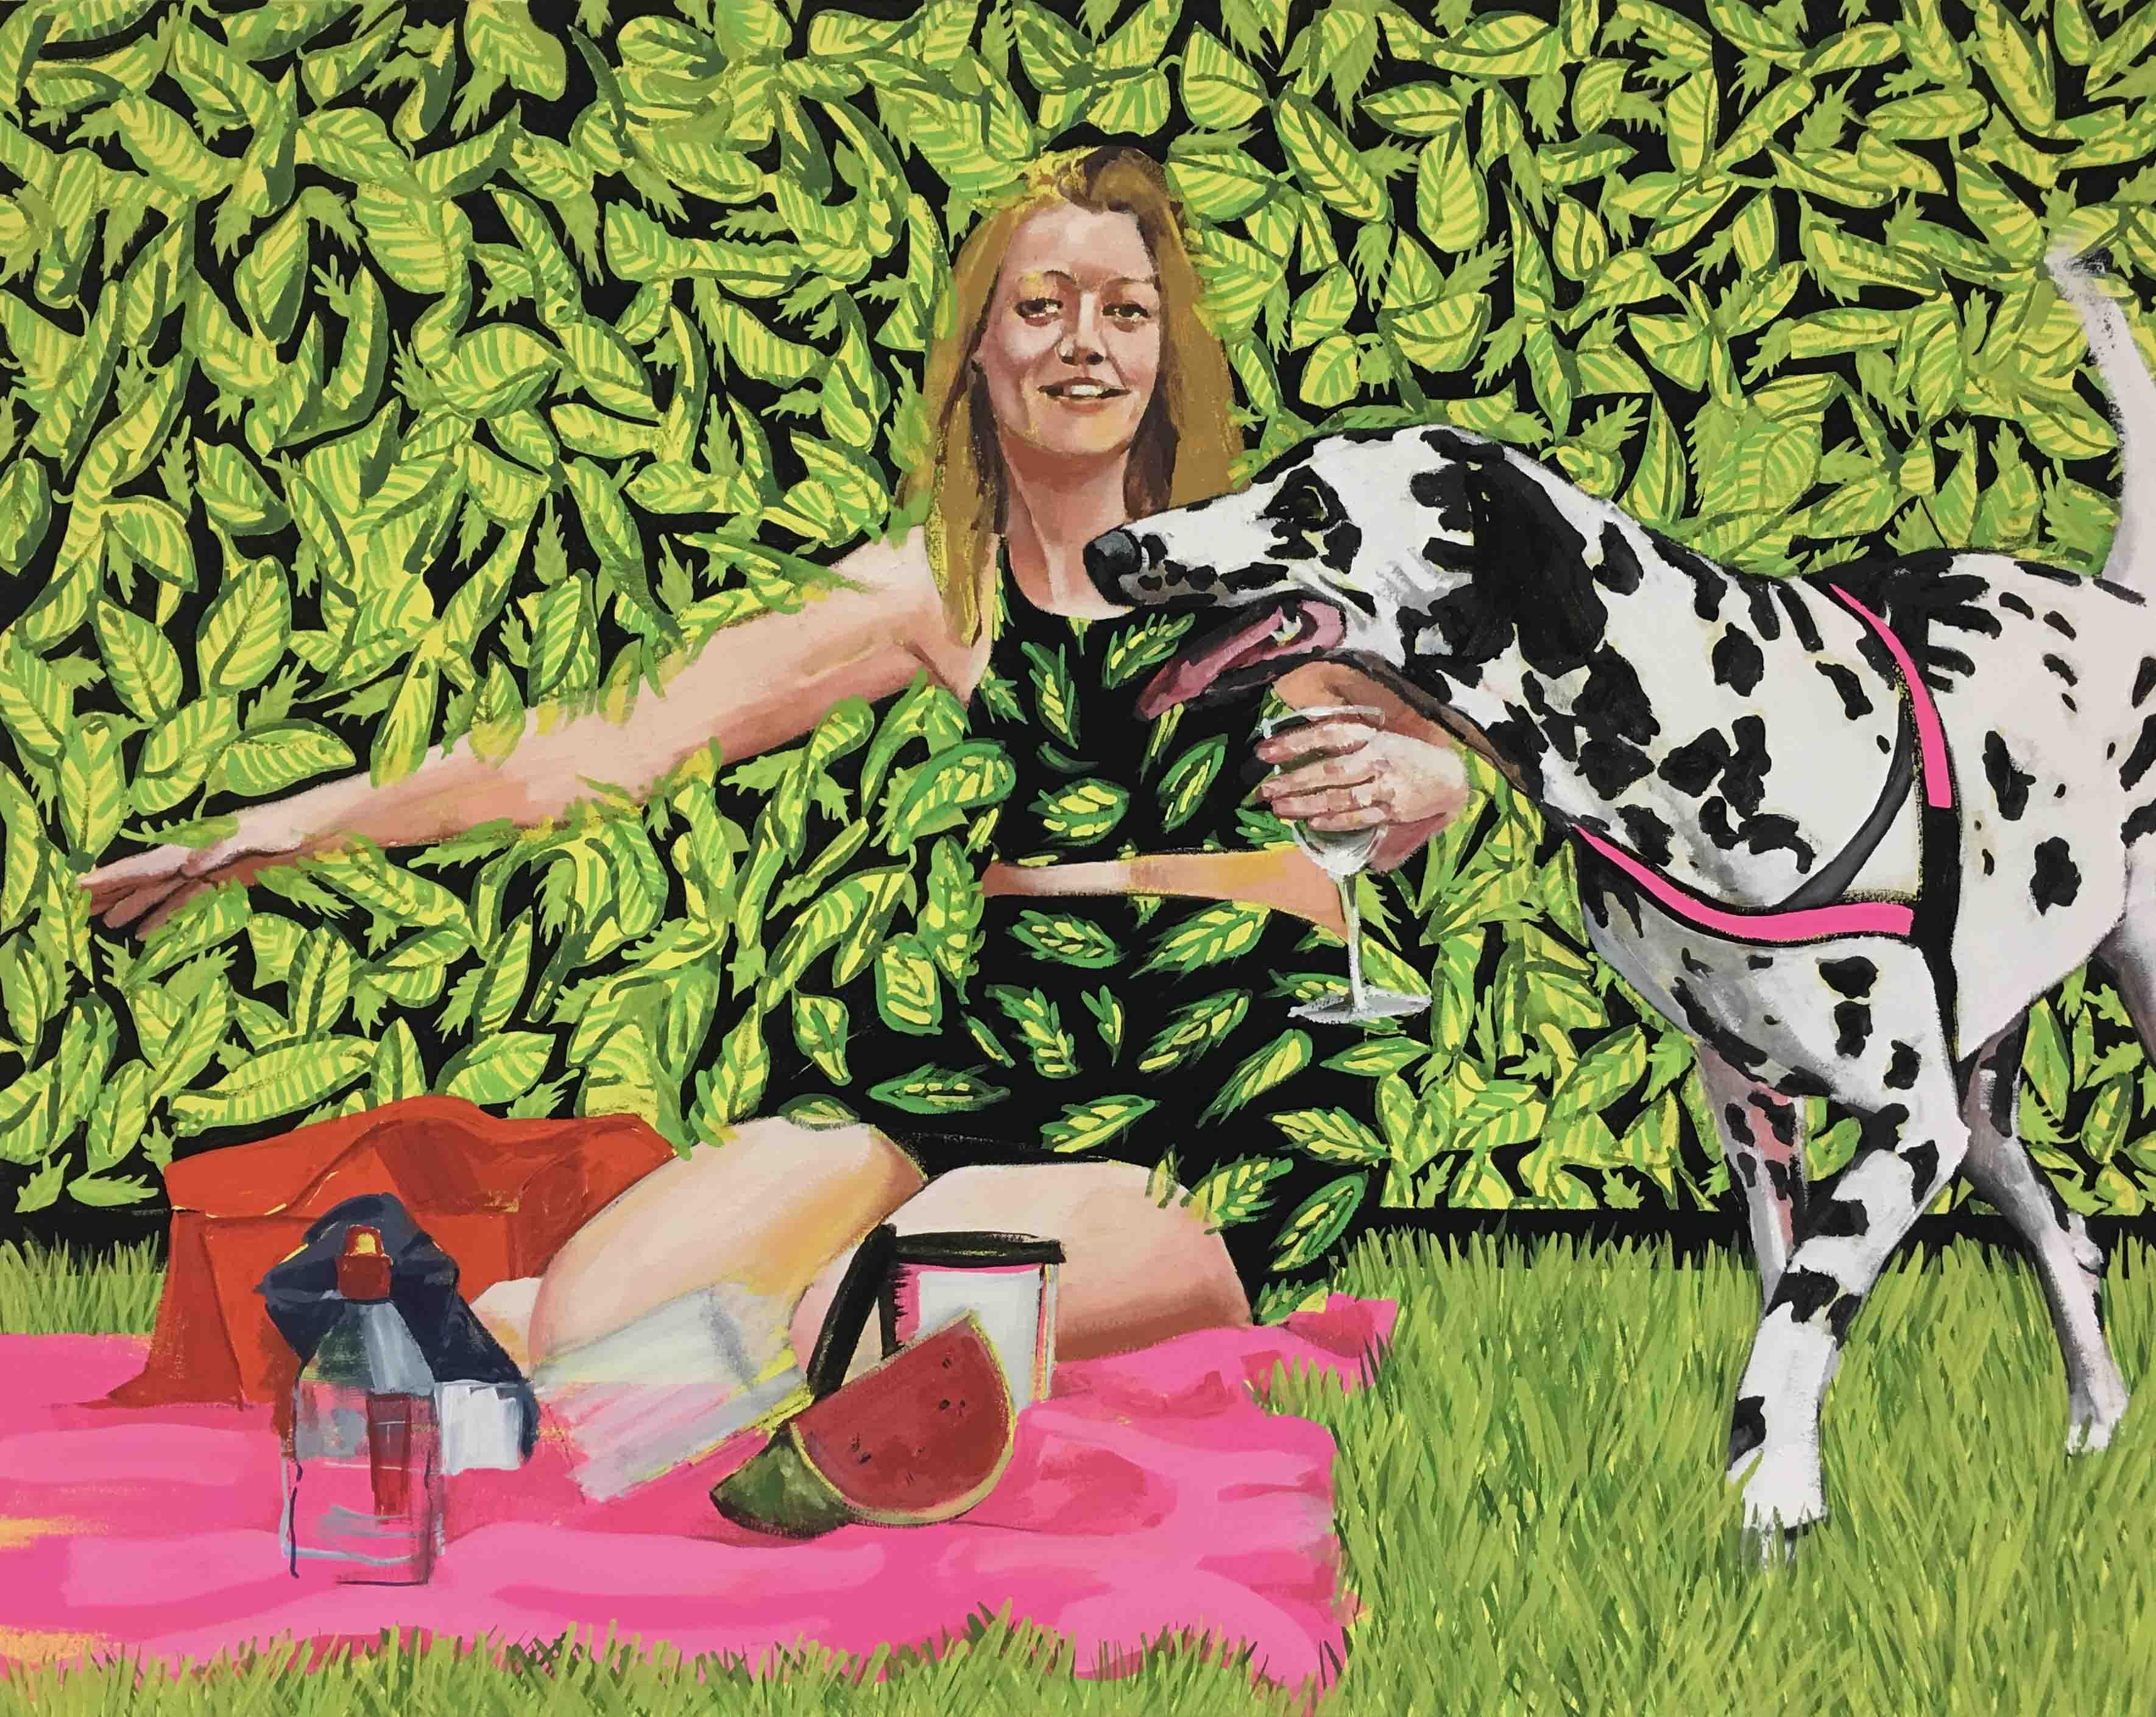 greener grass / 91 x 72 cm / mixed media on canvas / 2016